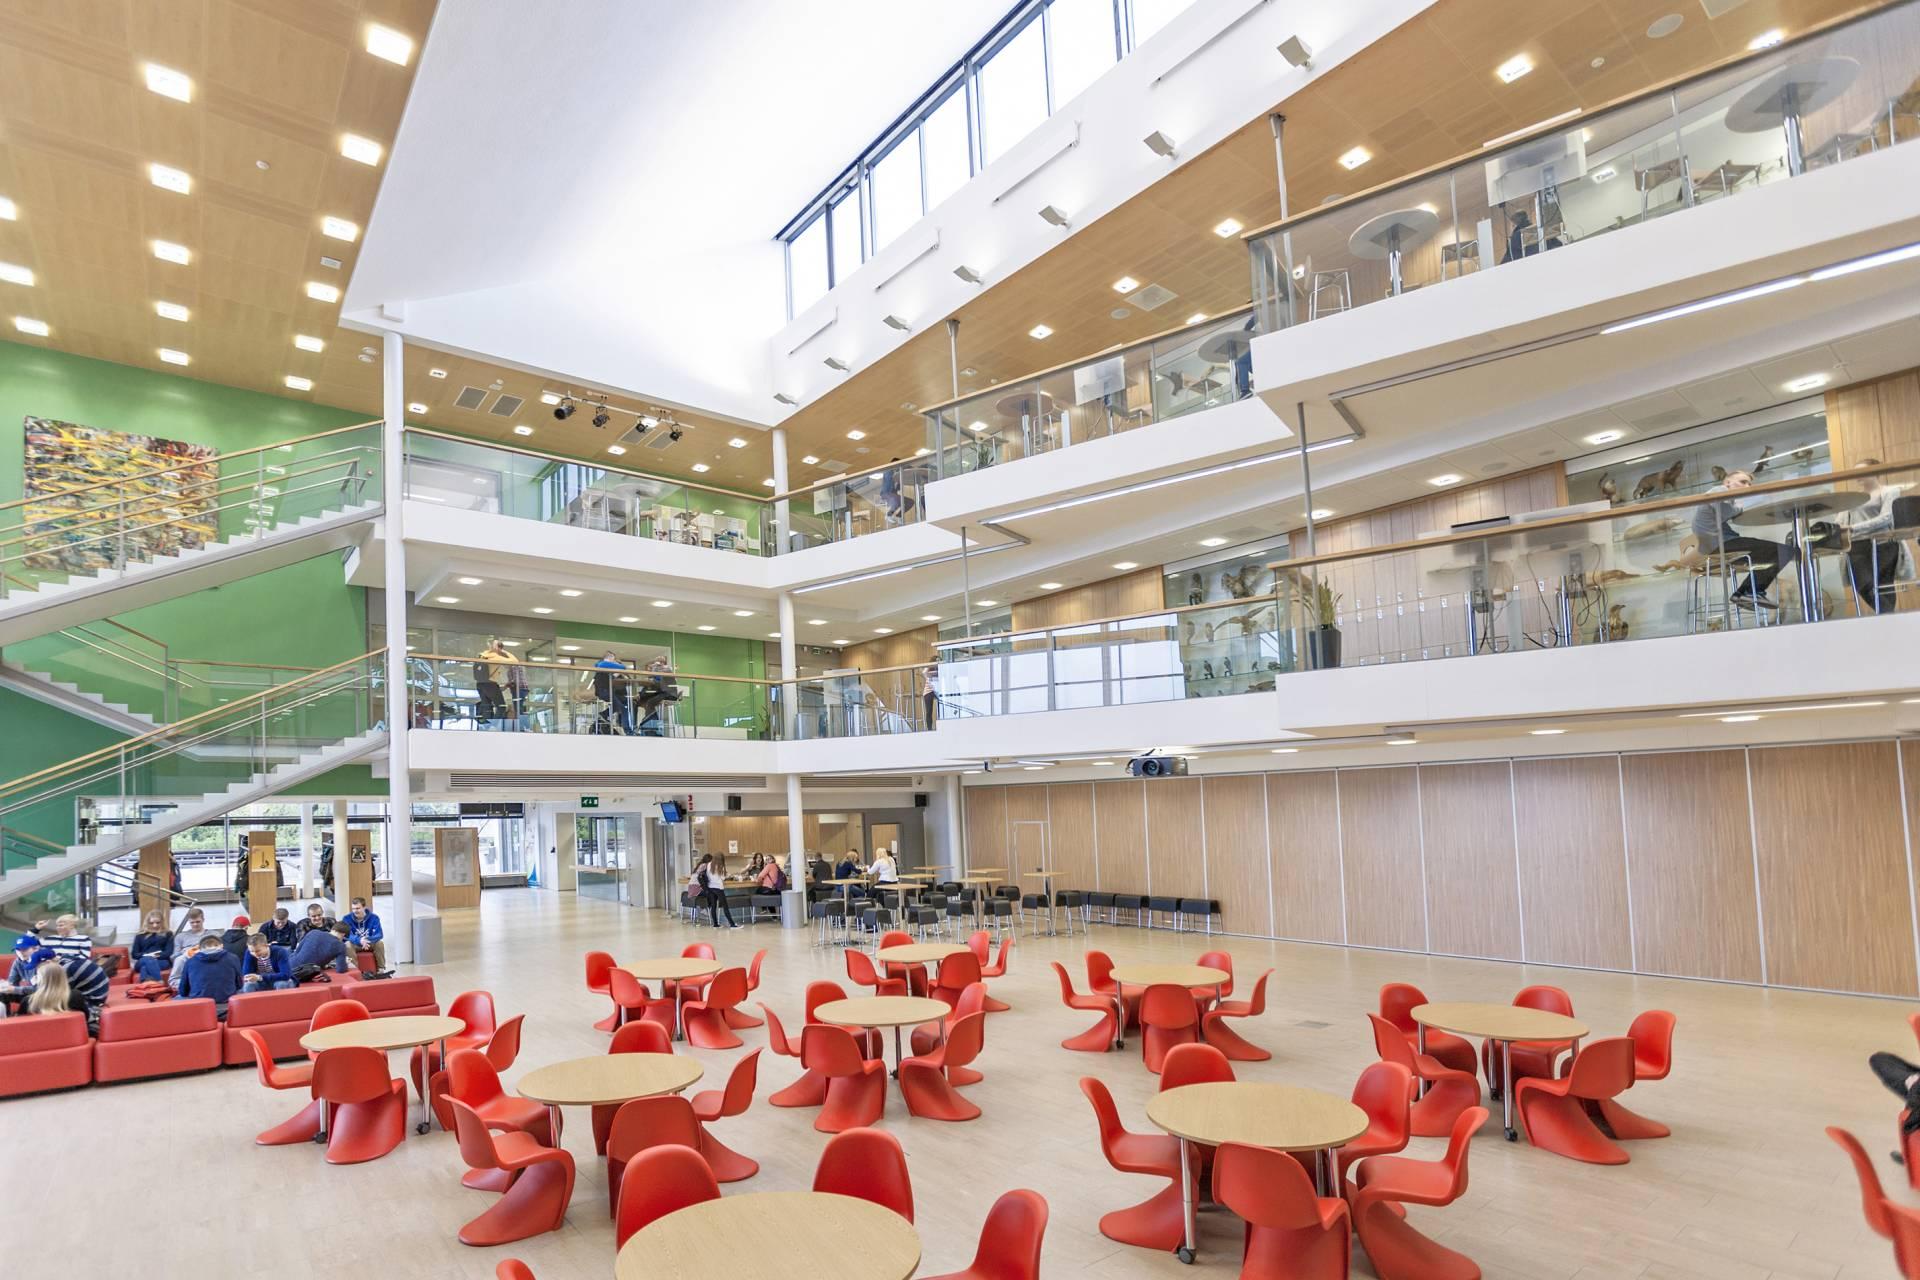 Valkeakoski Upper Secondary School